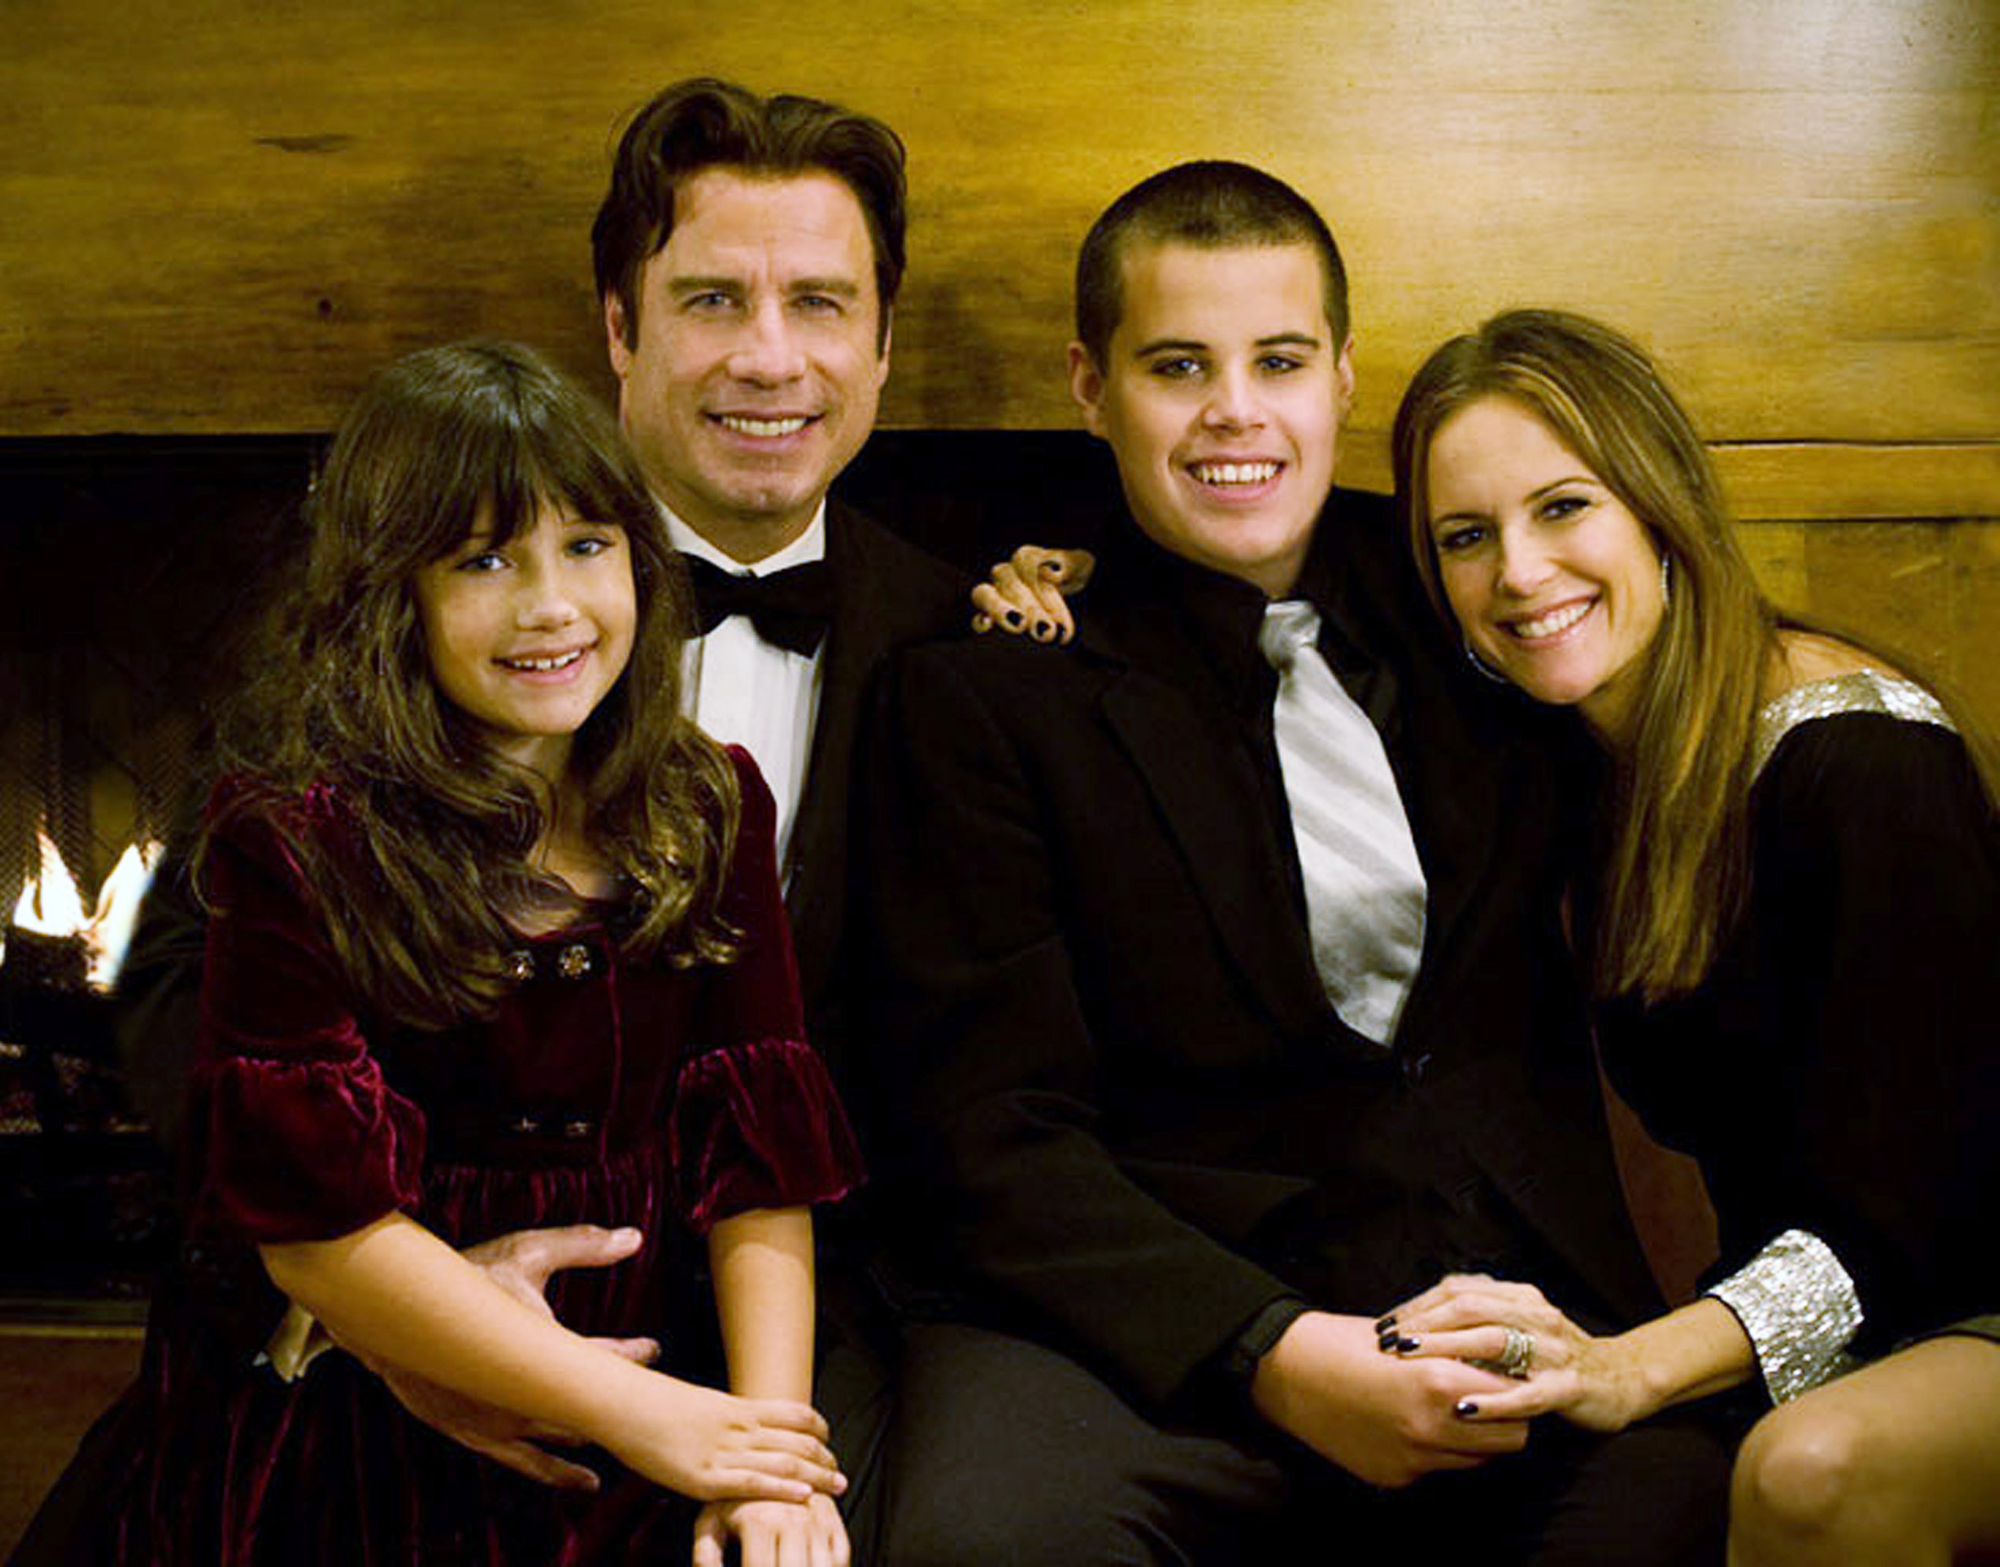 Kelly Preston Posts Heartfelt Message About Late Son Jett - John Travolta, his wife, Kelly Preston, and their children, Ella and Jett.